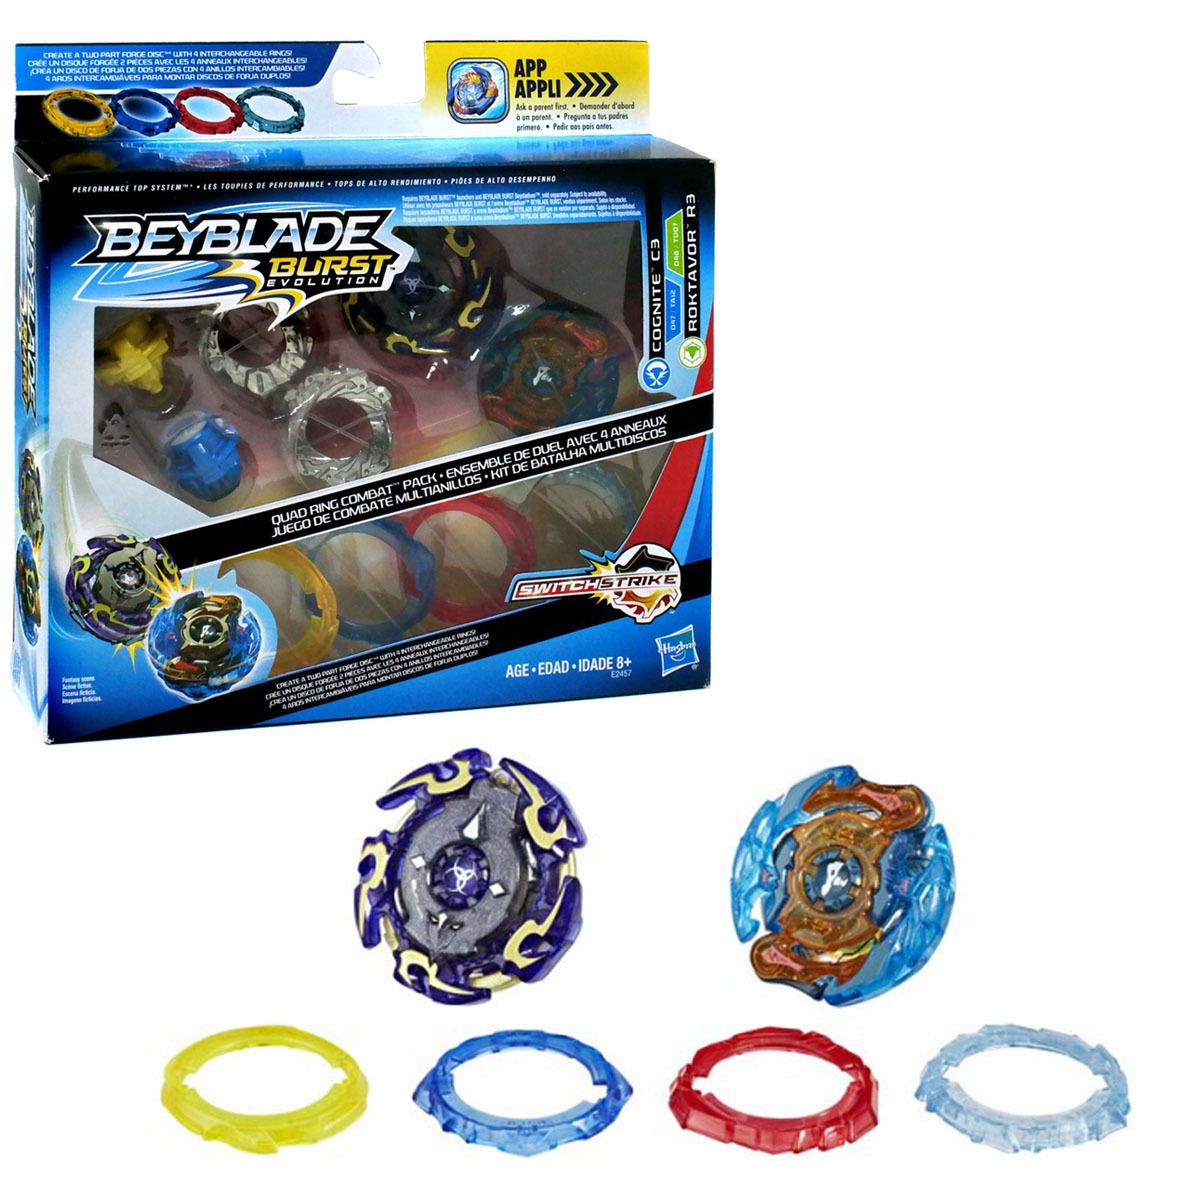 Beyblade Burst Evolution Quad Ring Combat Pack